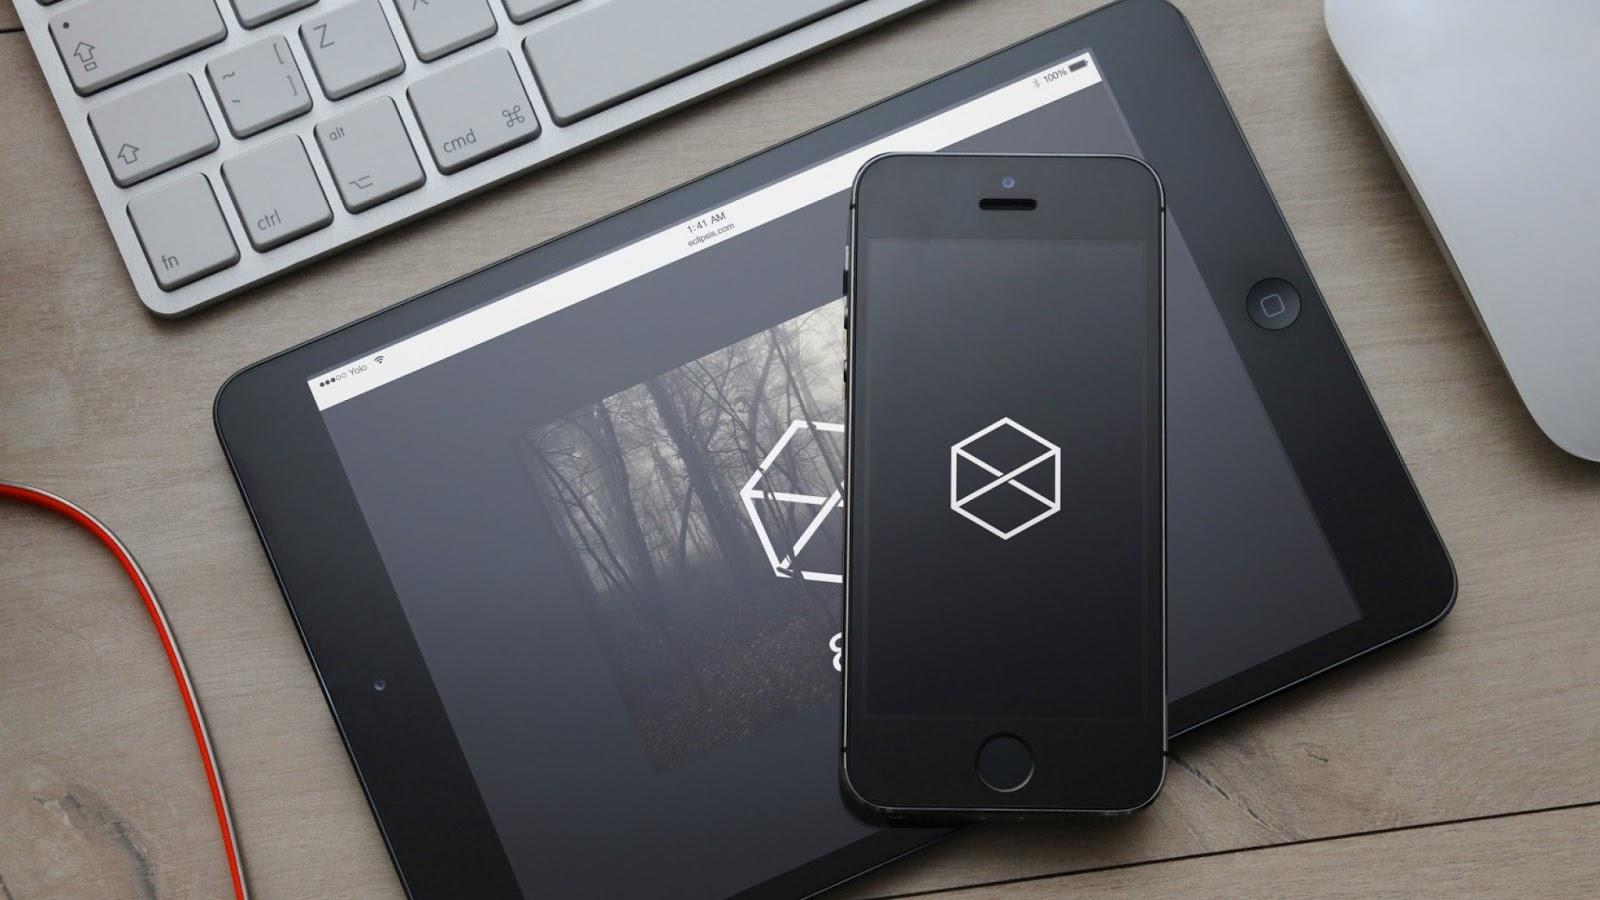 Gadgets Desktop HD Wallpapers - Whatsapp Status, Images